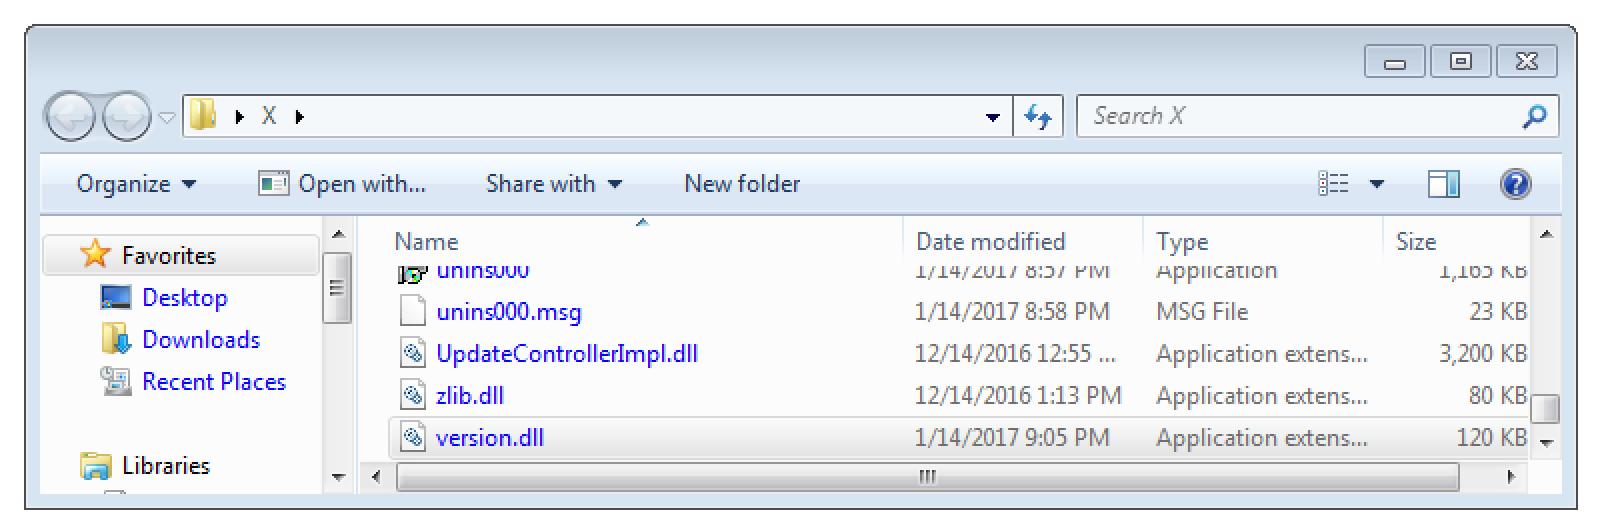 Local Privilege Escalation in Malwarebytes 3 by abusing NTFS